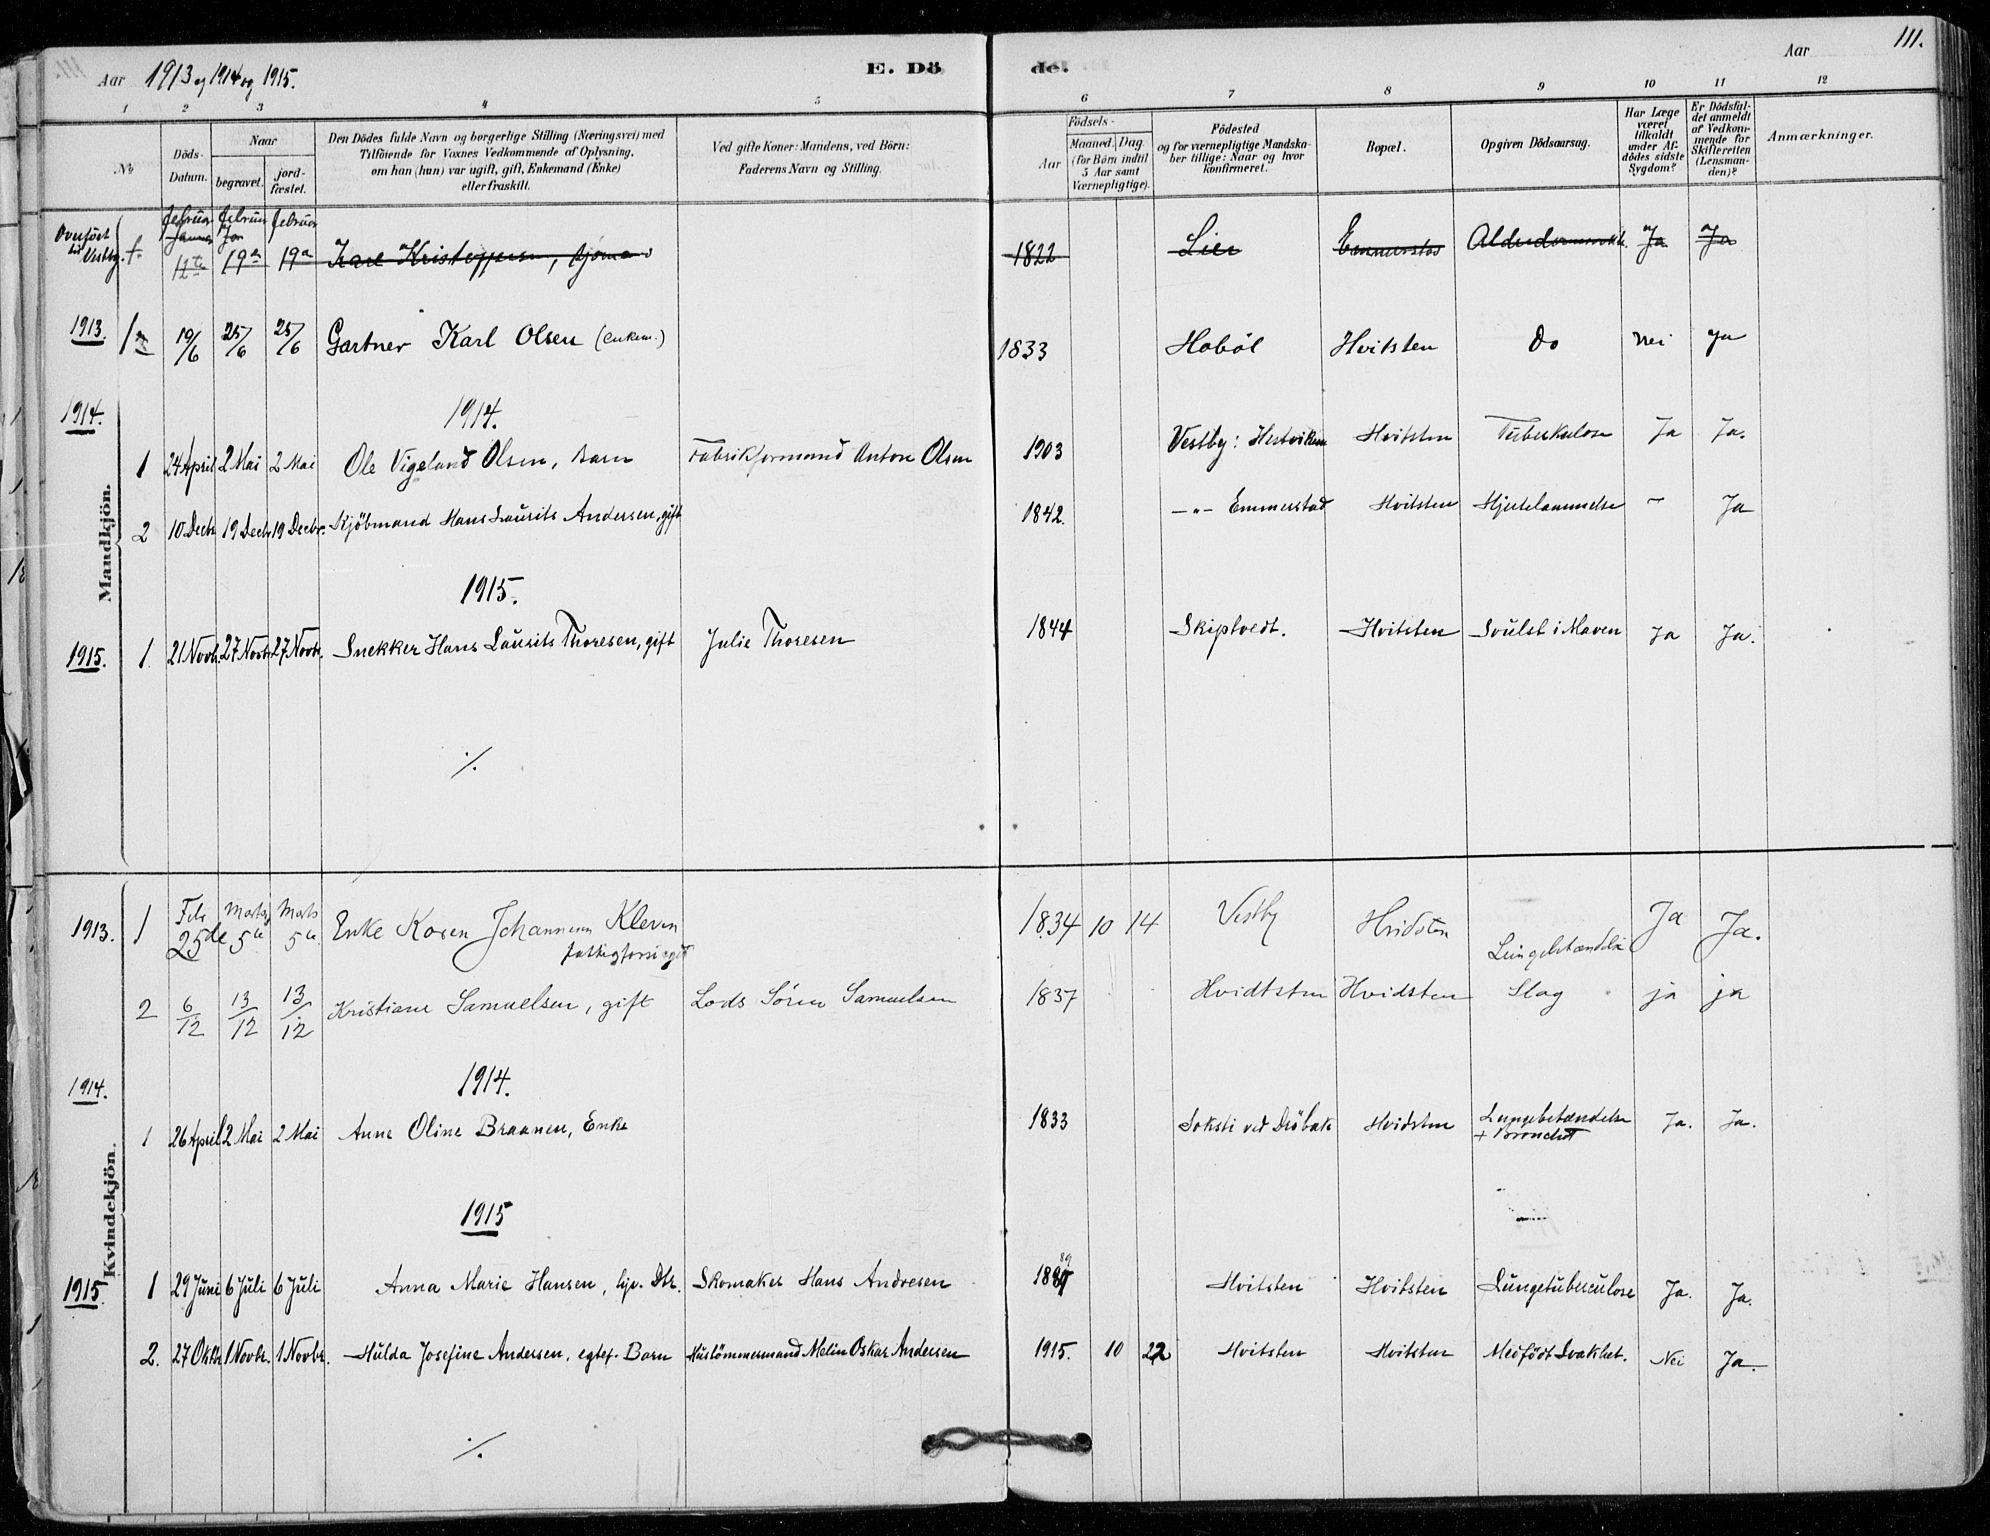 SAO, Vestby prestekontor Kirkebøker, F/Fd/L0001: Ministerialbok nr. IV 1, 1878-1945, s. 111